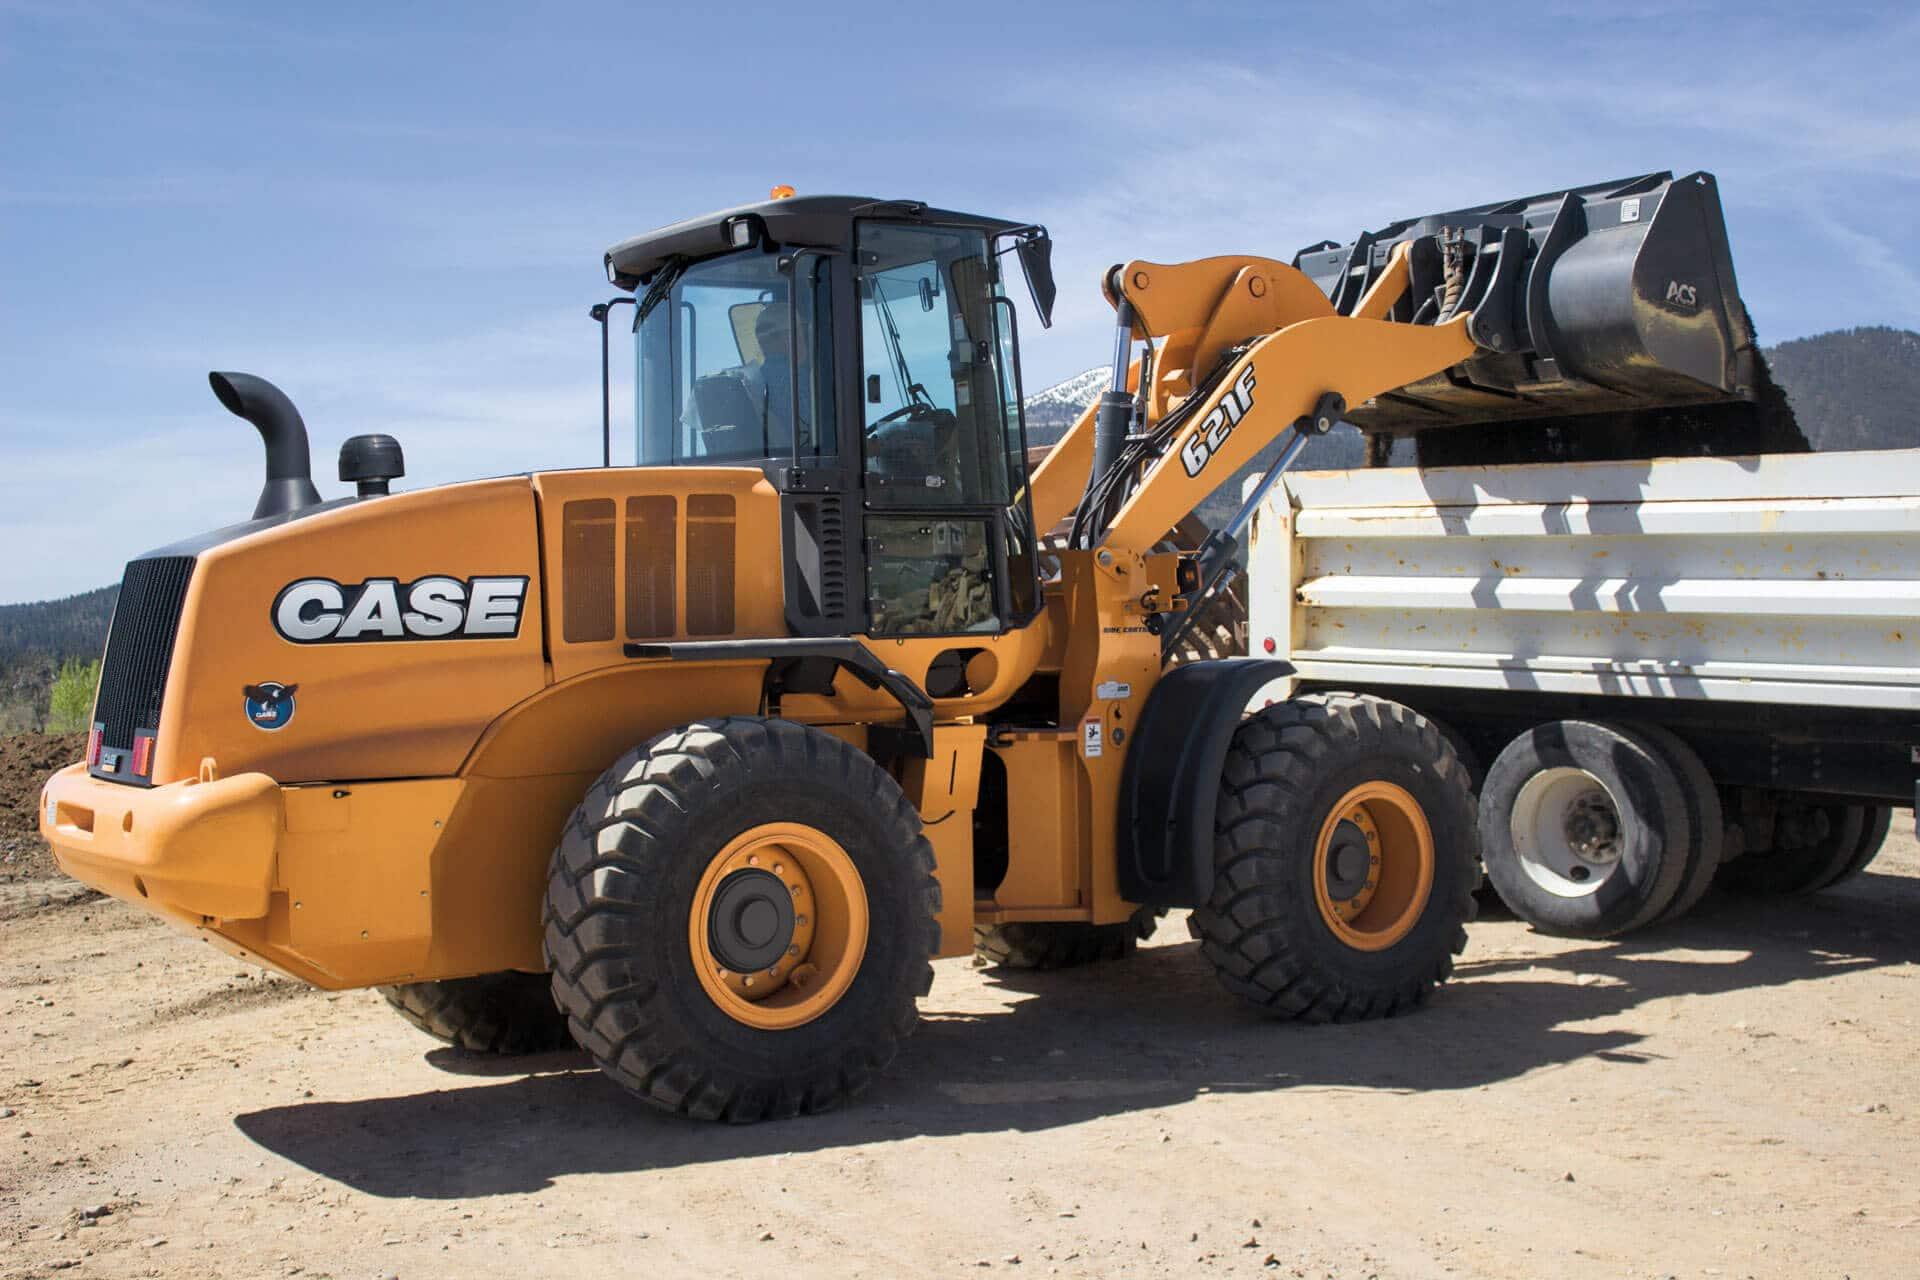 CASE 621F Wheel Loader | CASE Construction Equipment